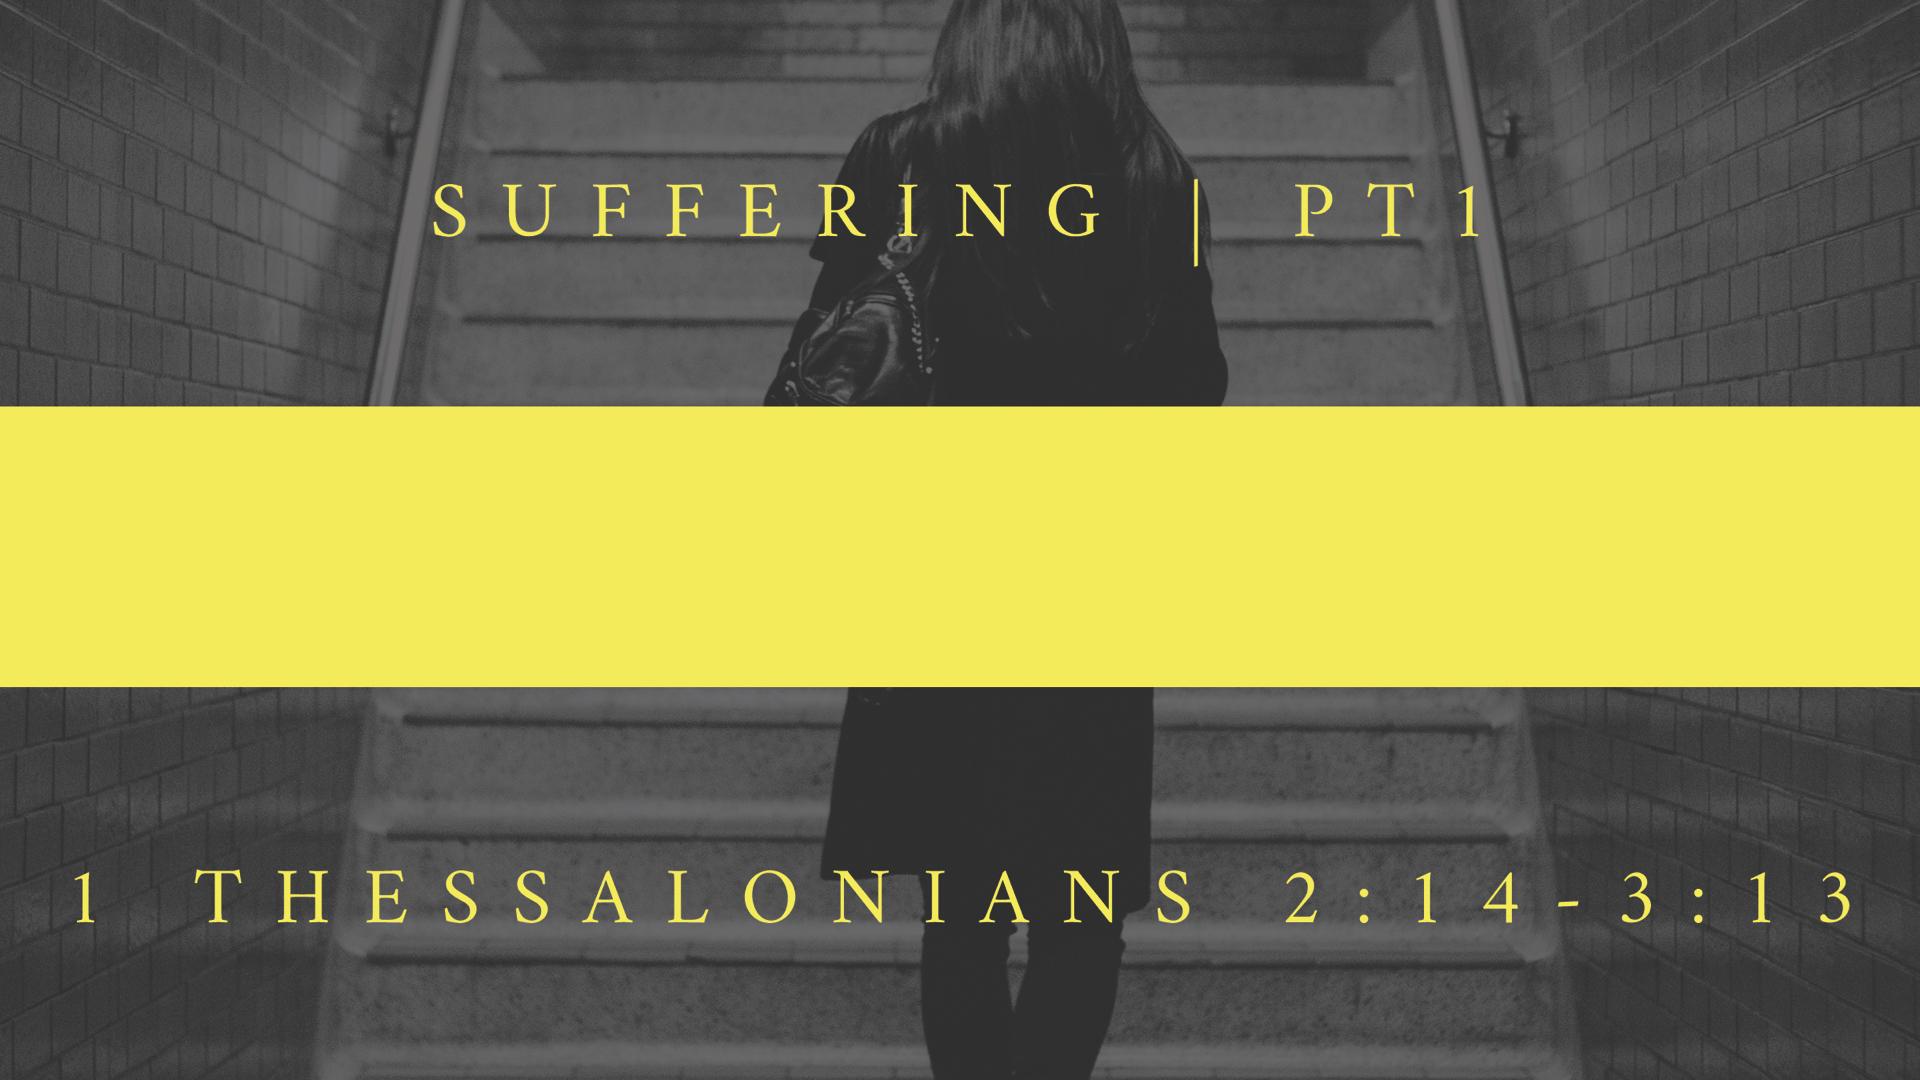 Suffering (pt1).008.jpeg